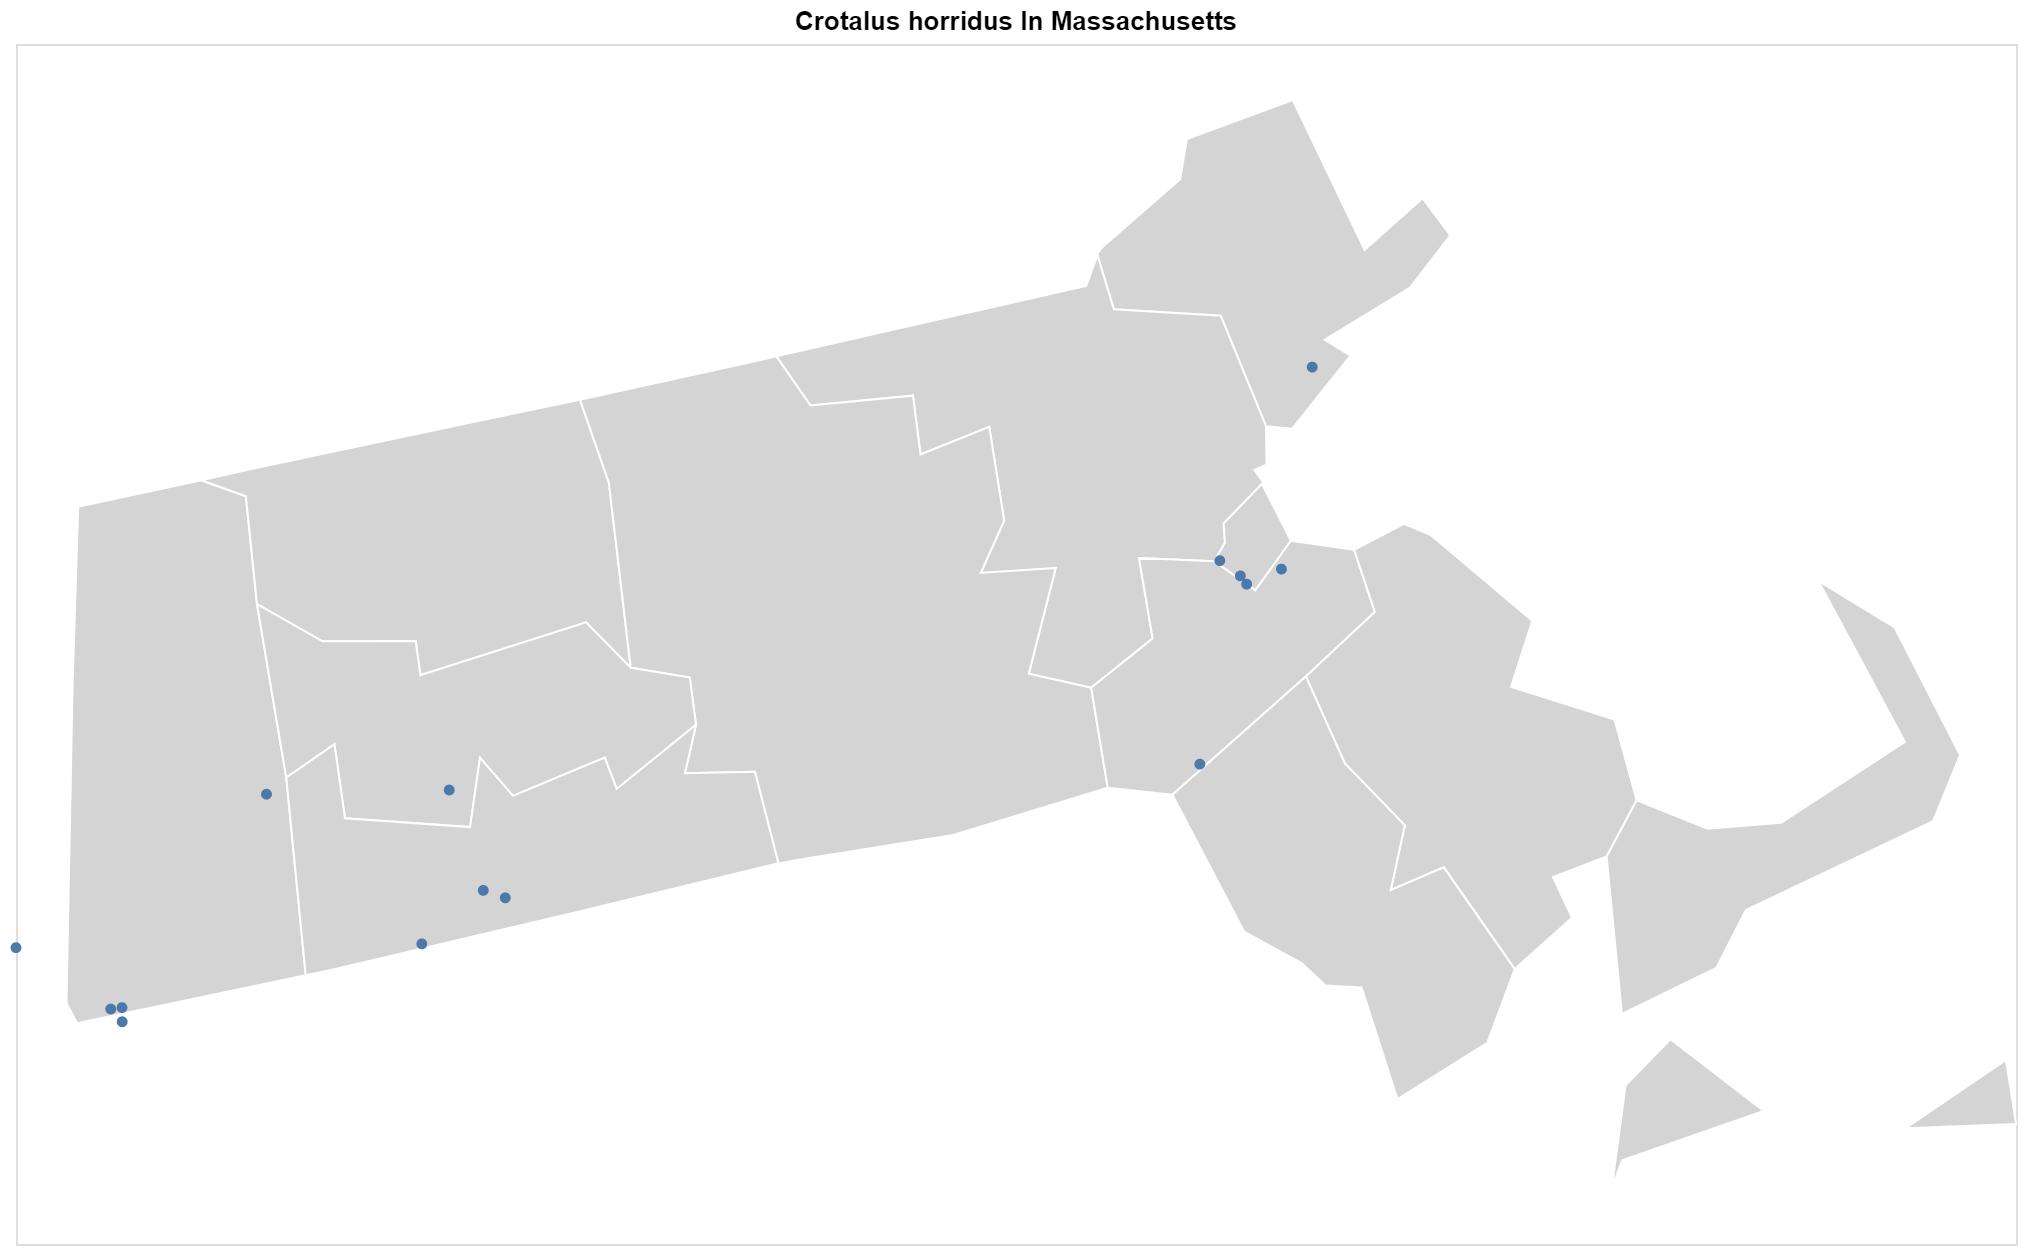 Crotalus horridus Massachusetts map